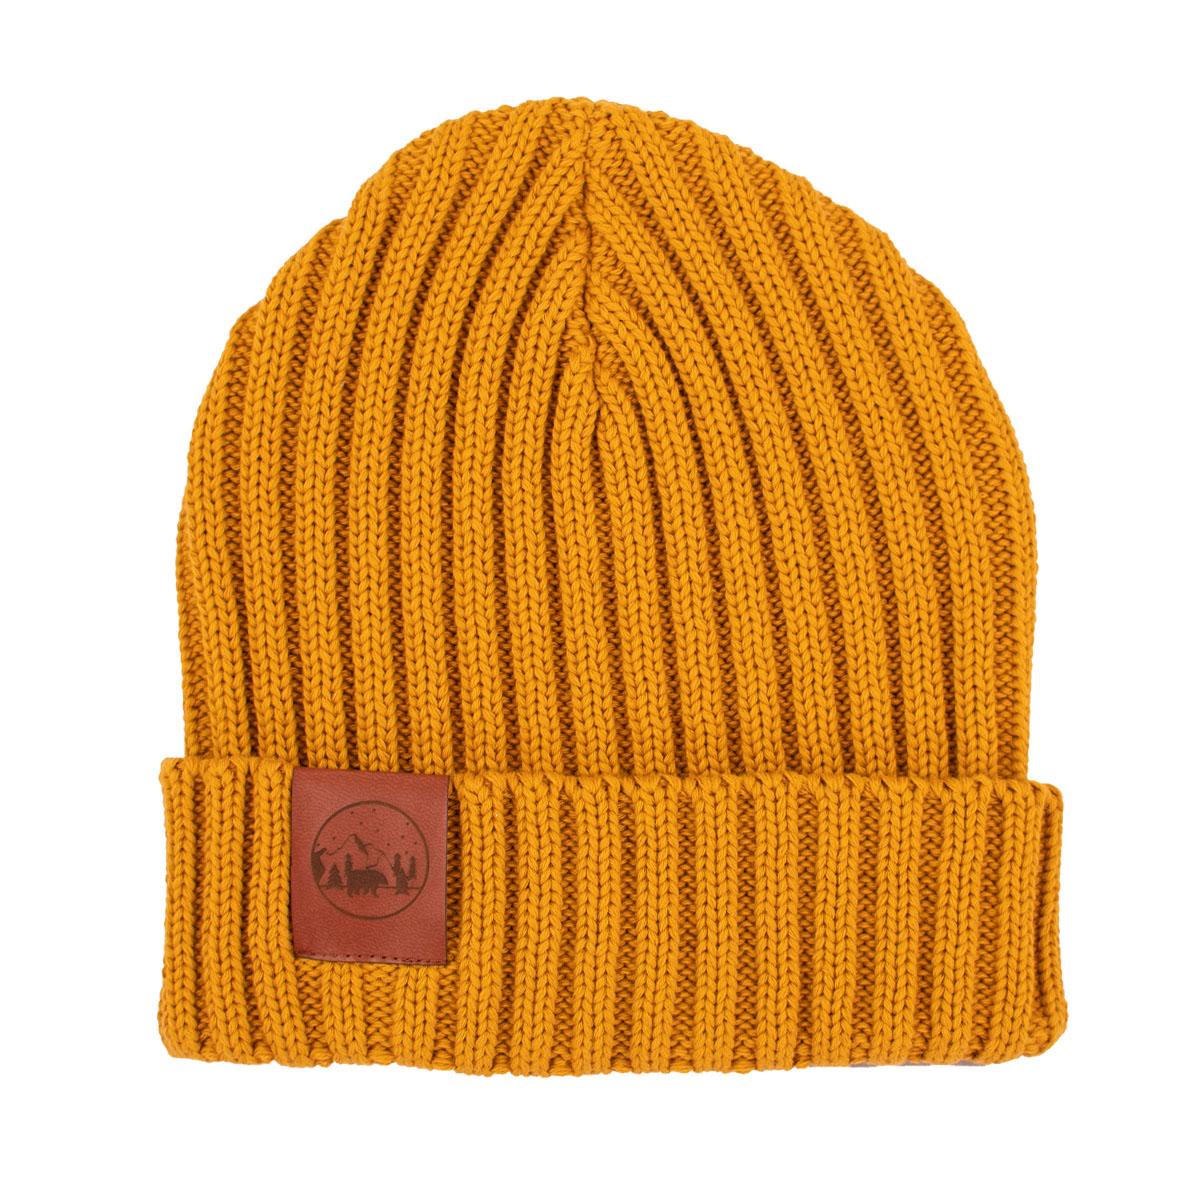 hat_alcatraz_cotton_mustard2012km_kabak_5906742647280